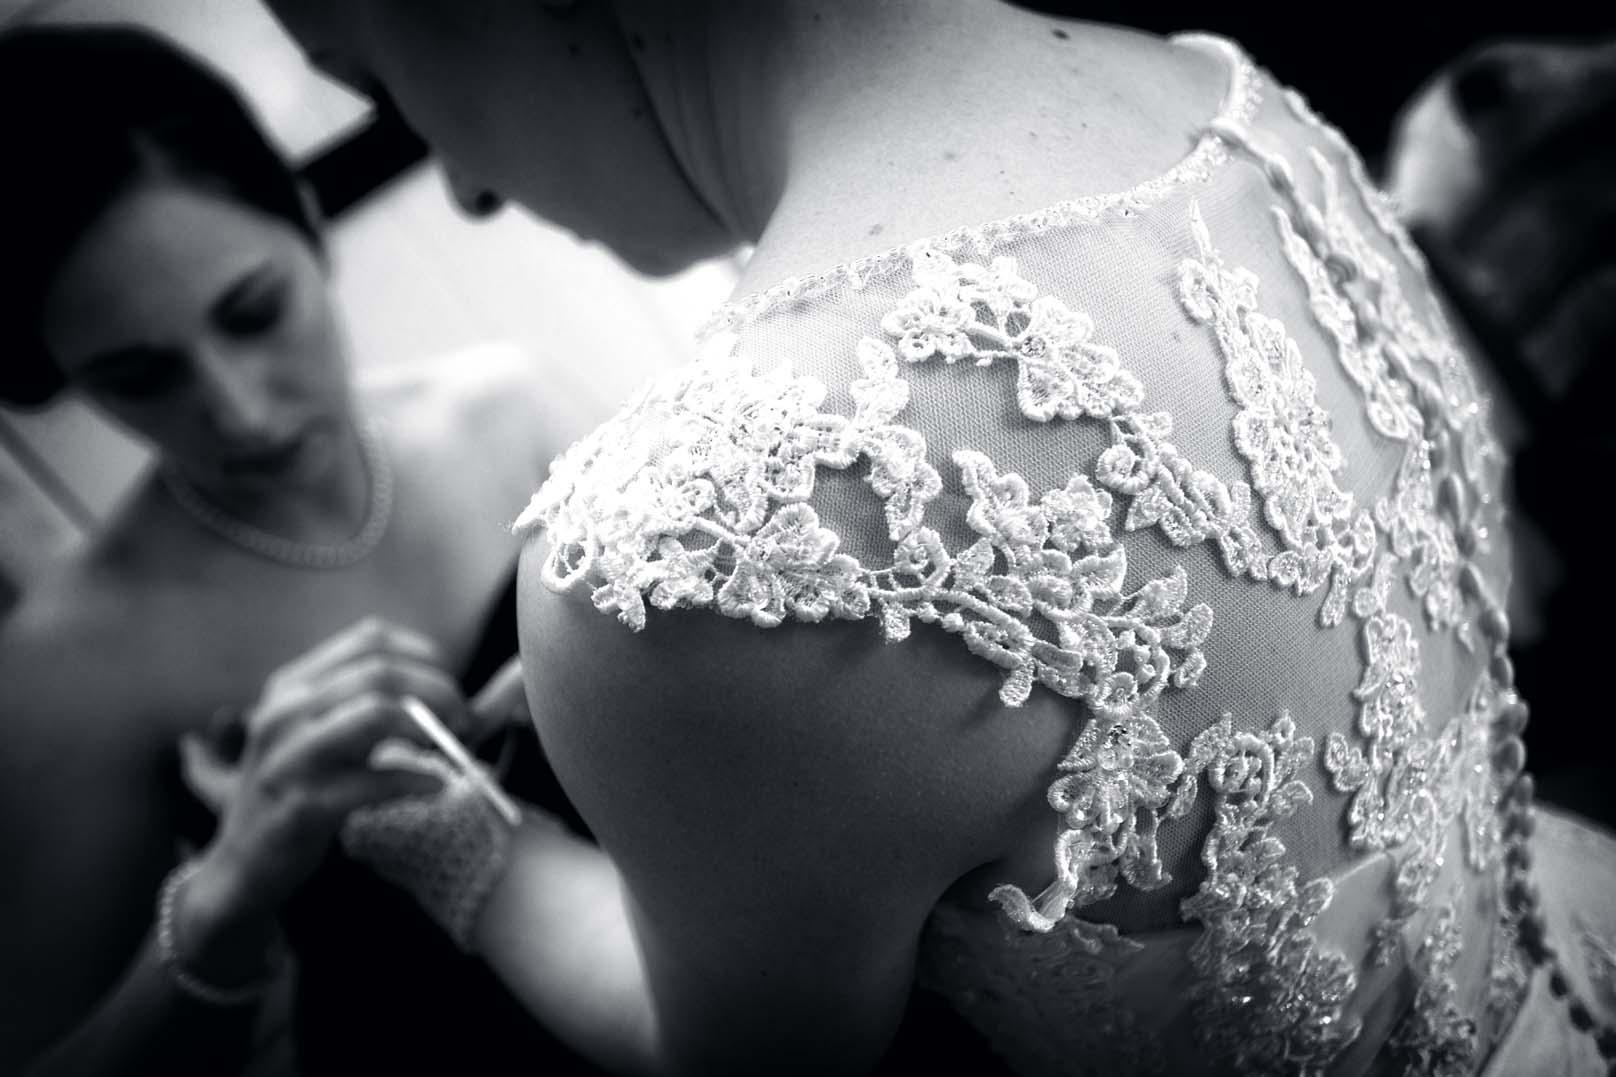 Brides dress